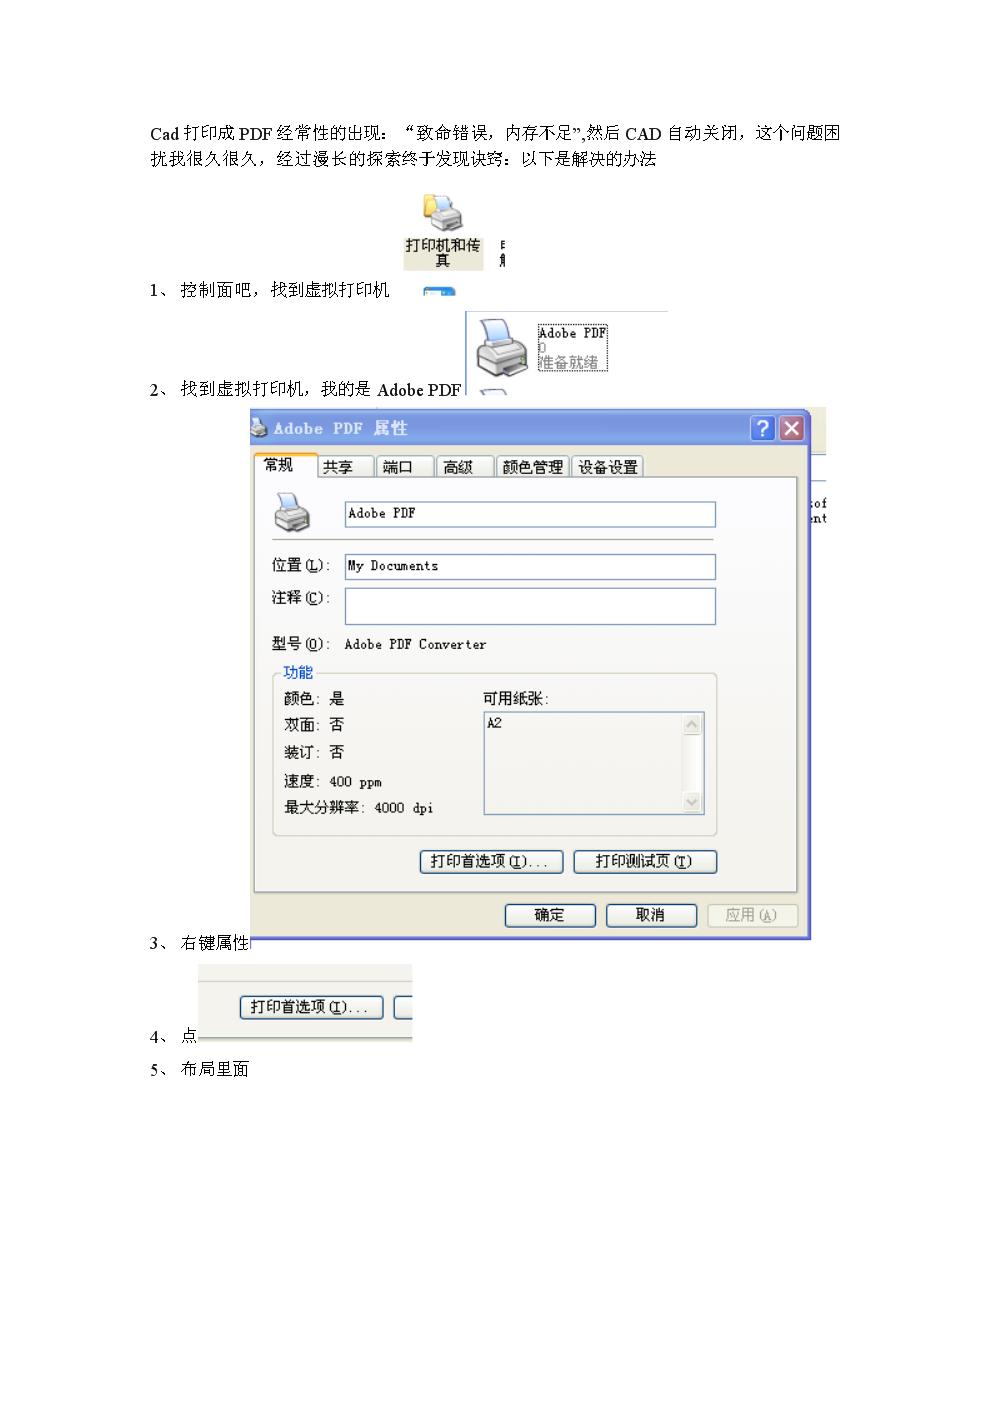 CAD定义成PDF解决办法致命错误.doccad2006打印块图片